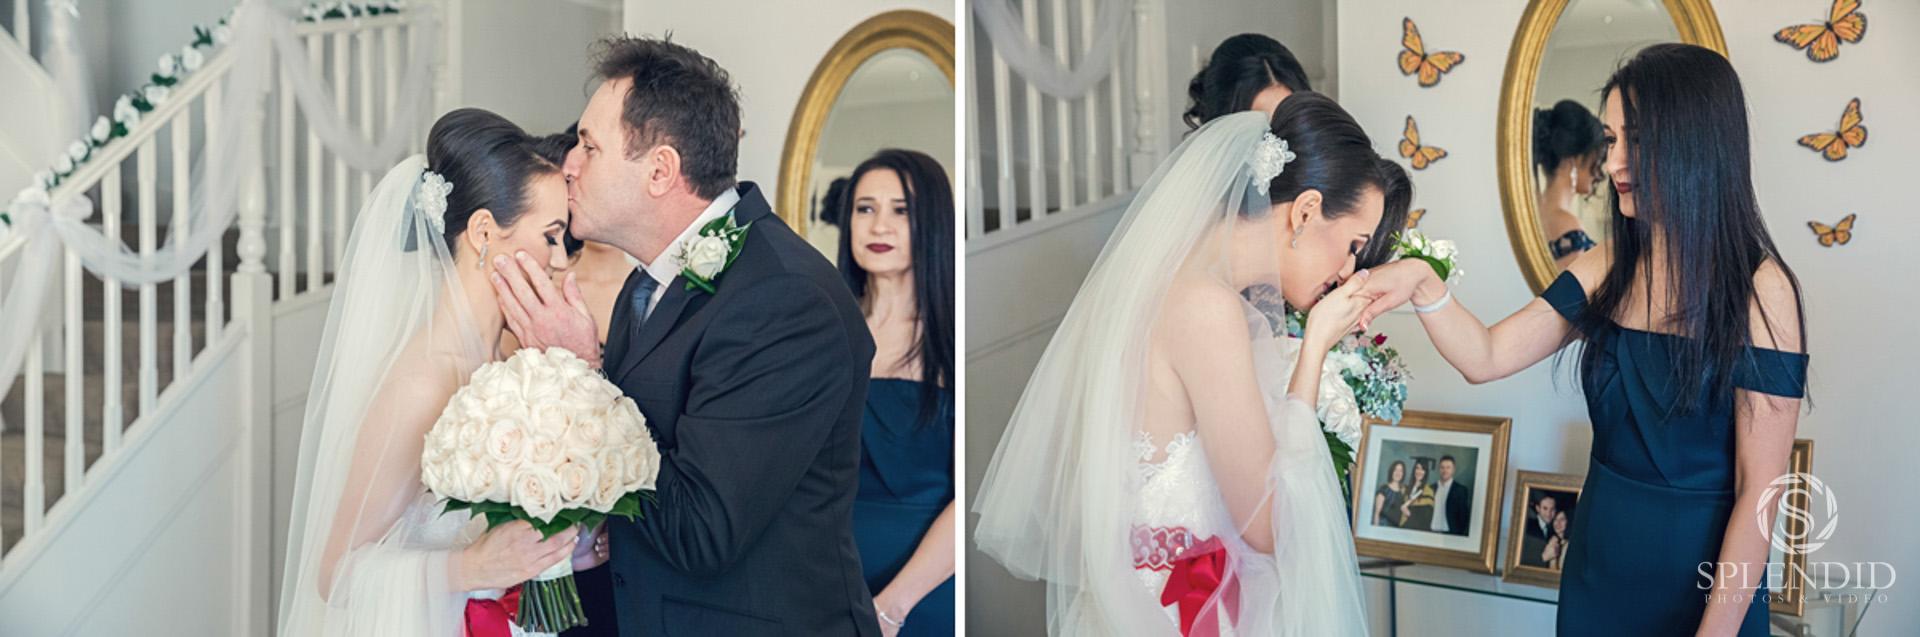 Cem and Cisem Wedding_25